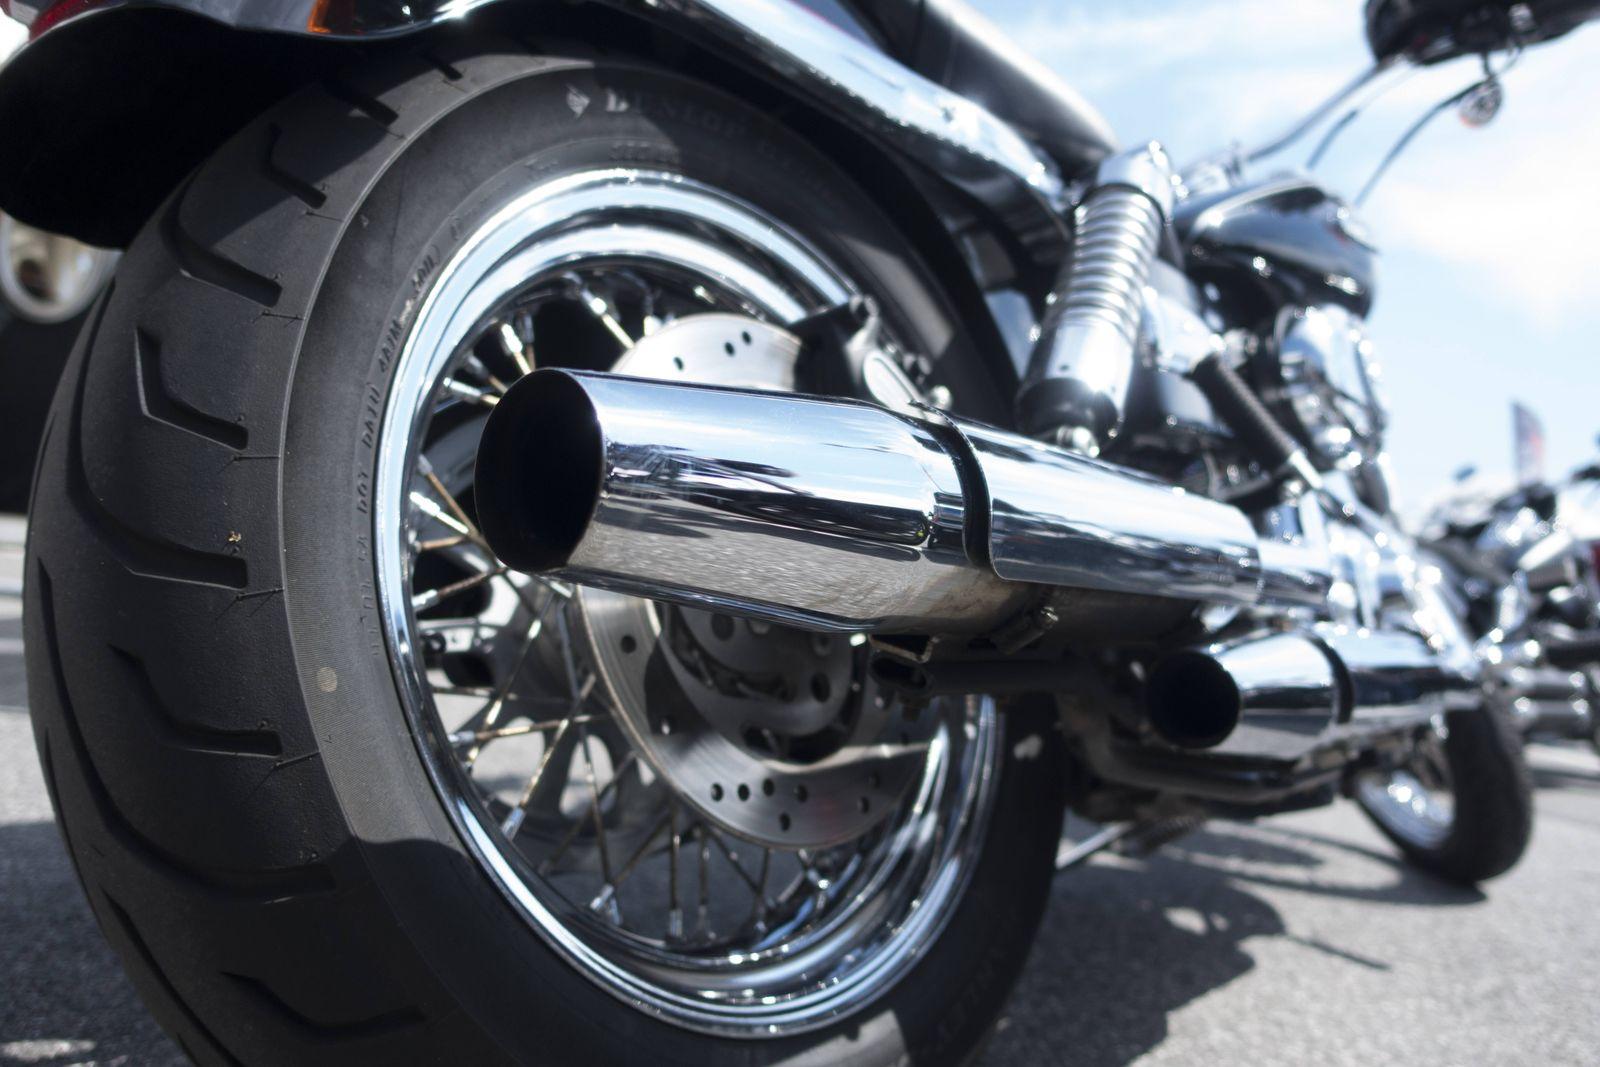 Exhaust system of a Harley Davidson PUBLICATIONxINxGERxSUIxAUTxHUNxONLY JWA000186